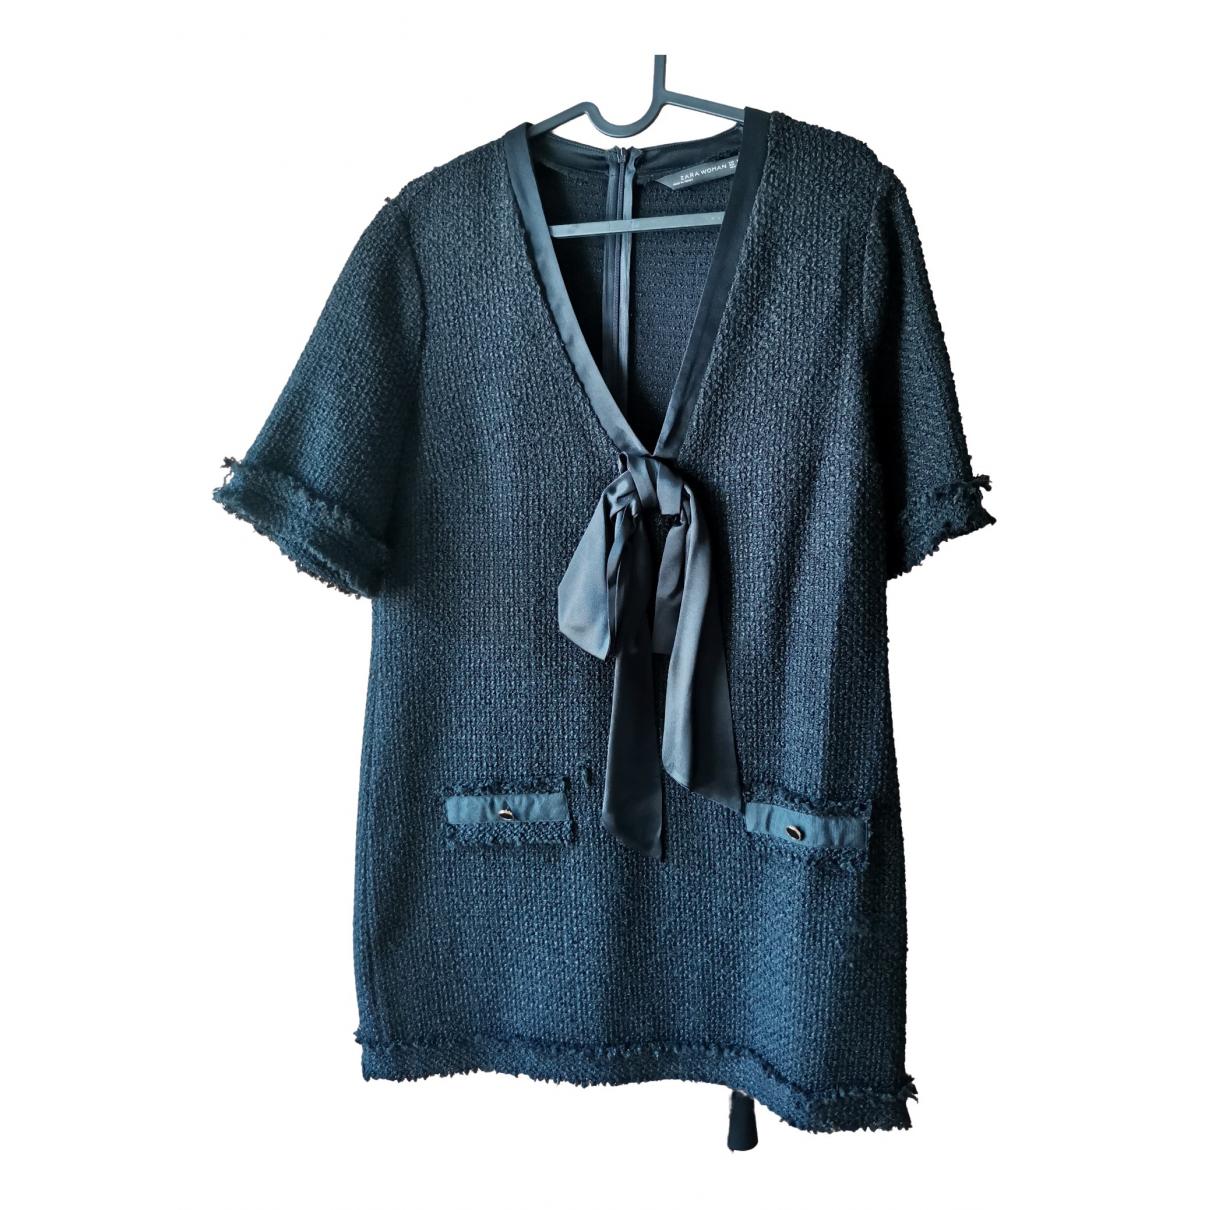 Zara - Robe   pour femme en tweed - noir